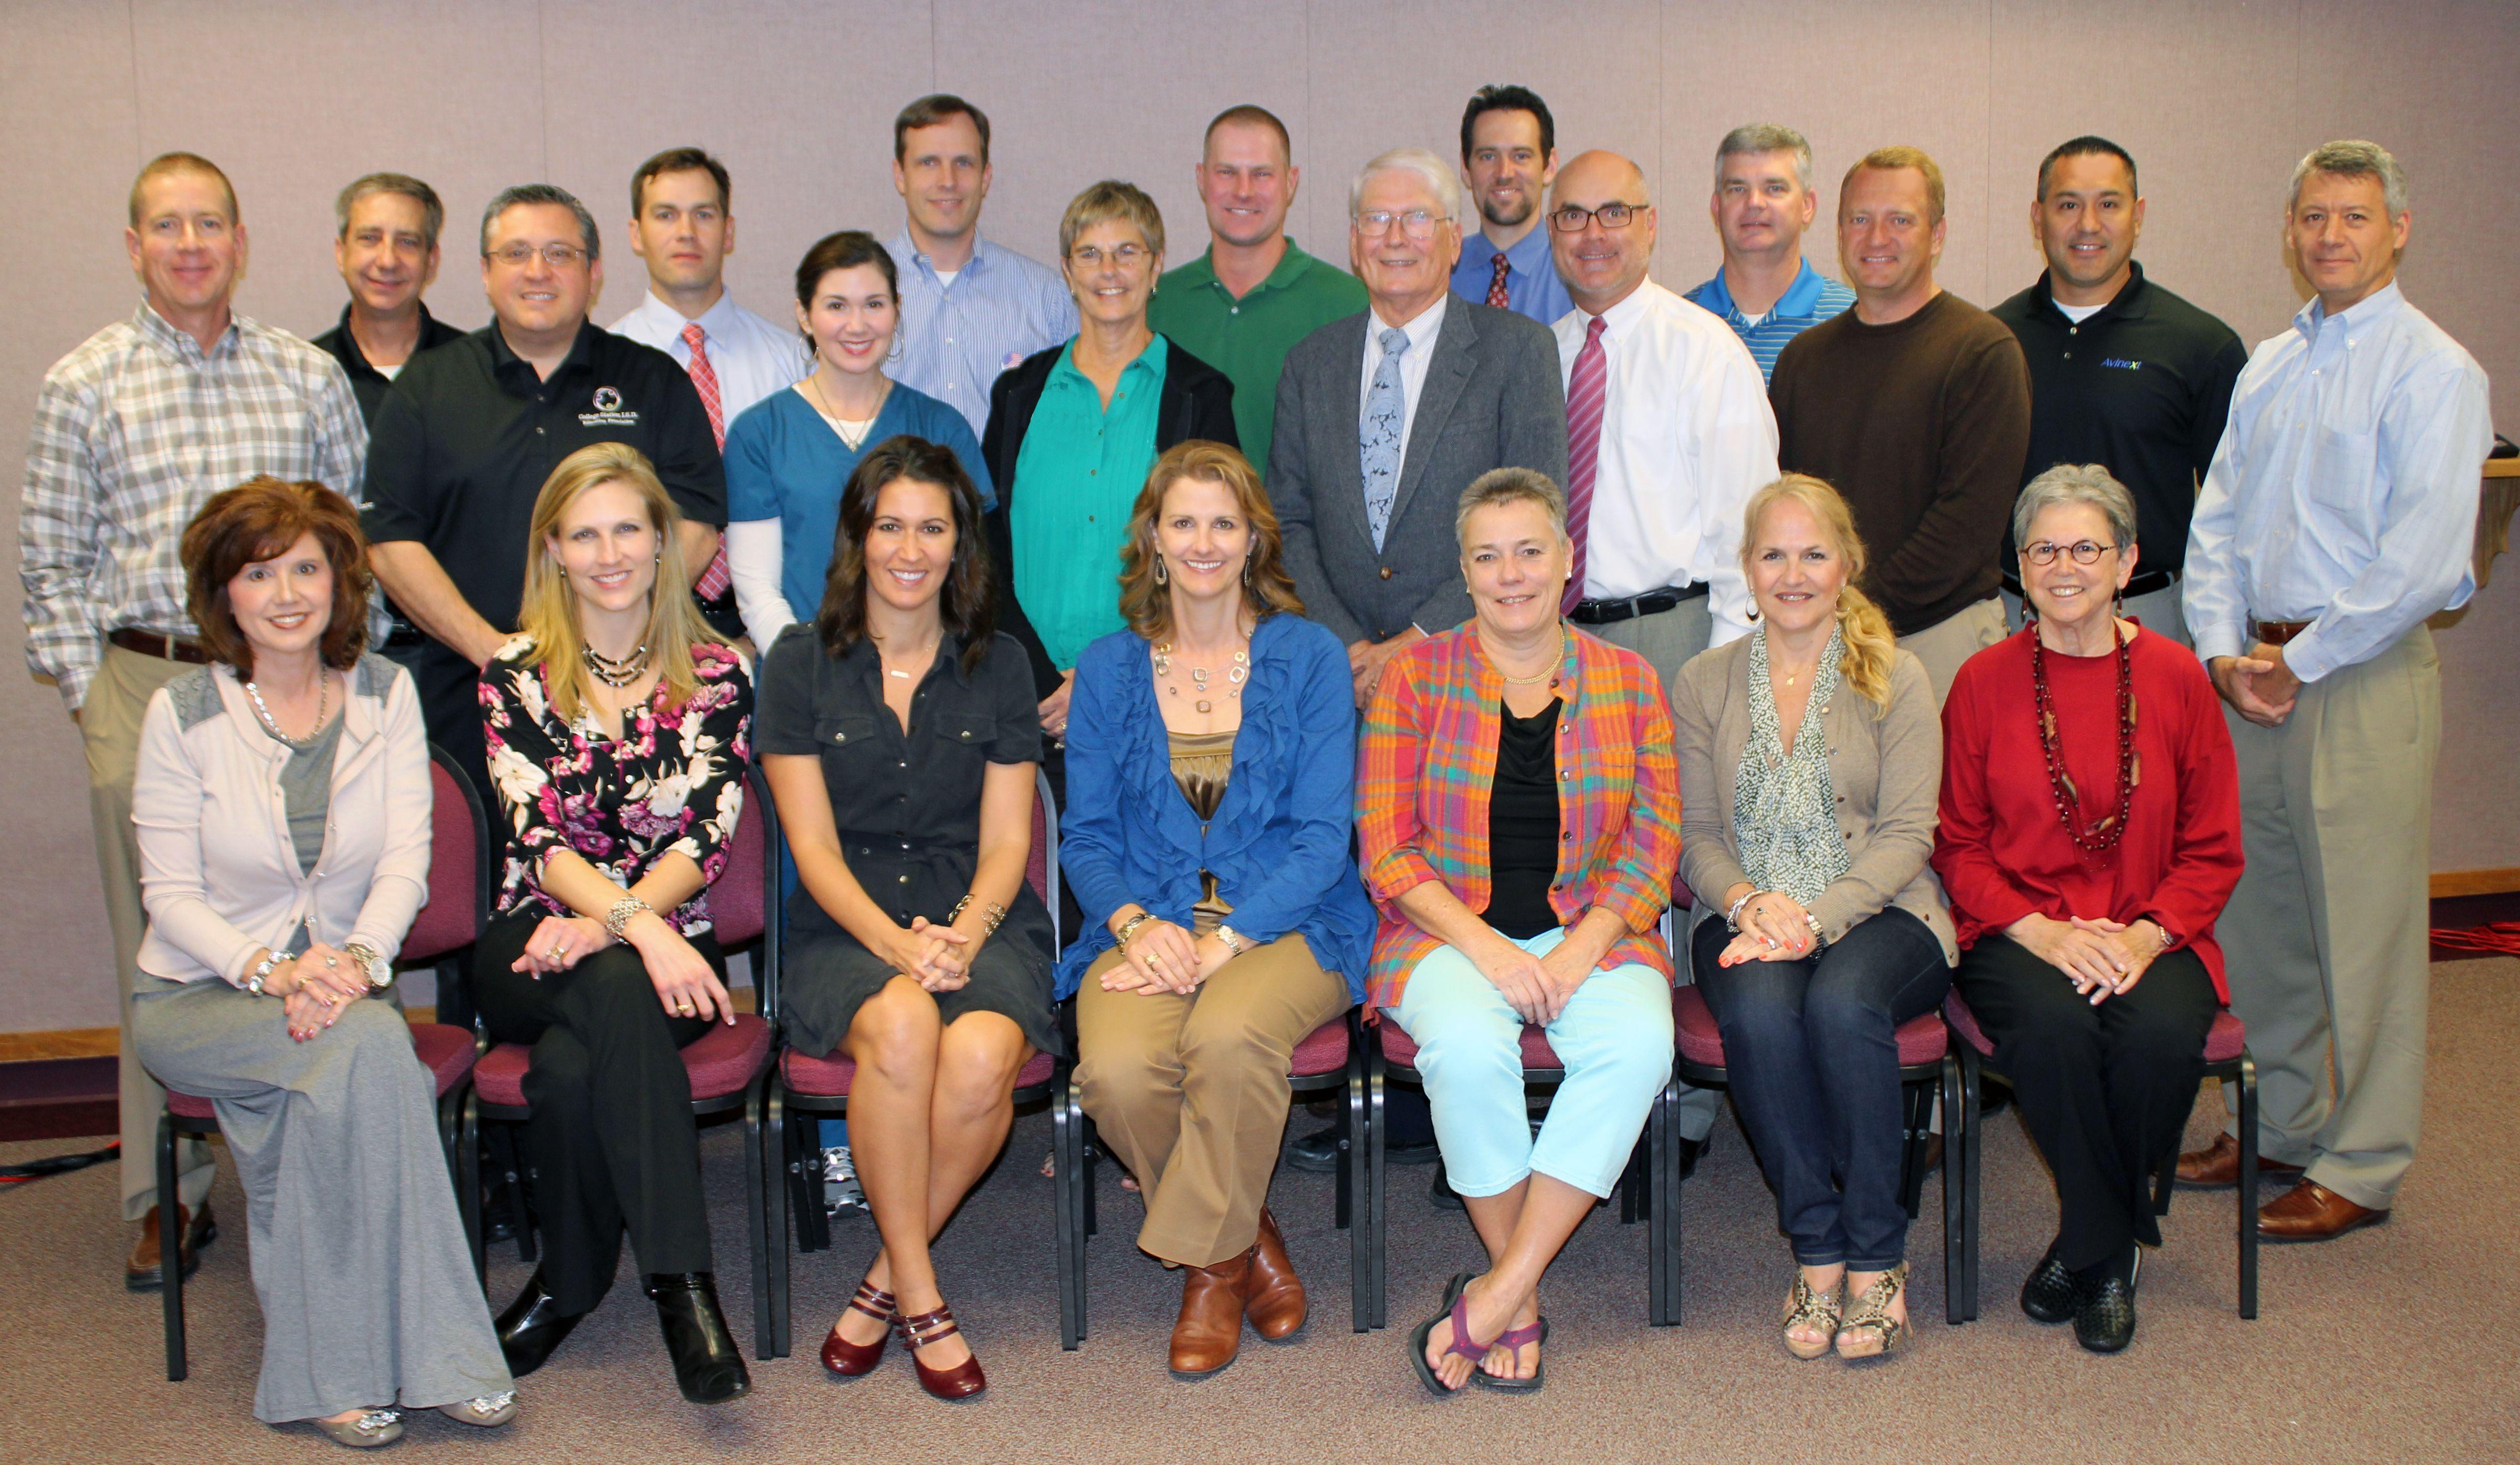 2013-14 Board of Directors